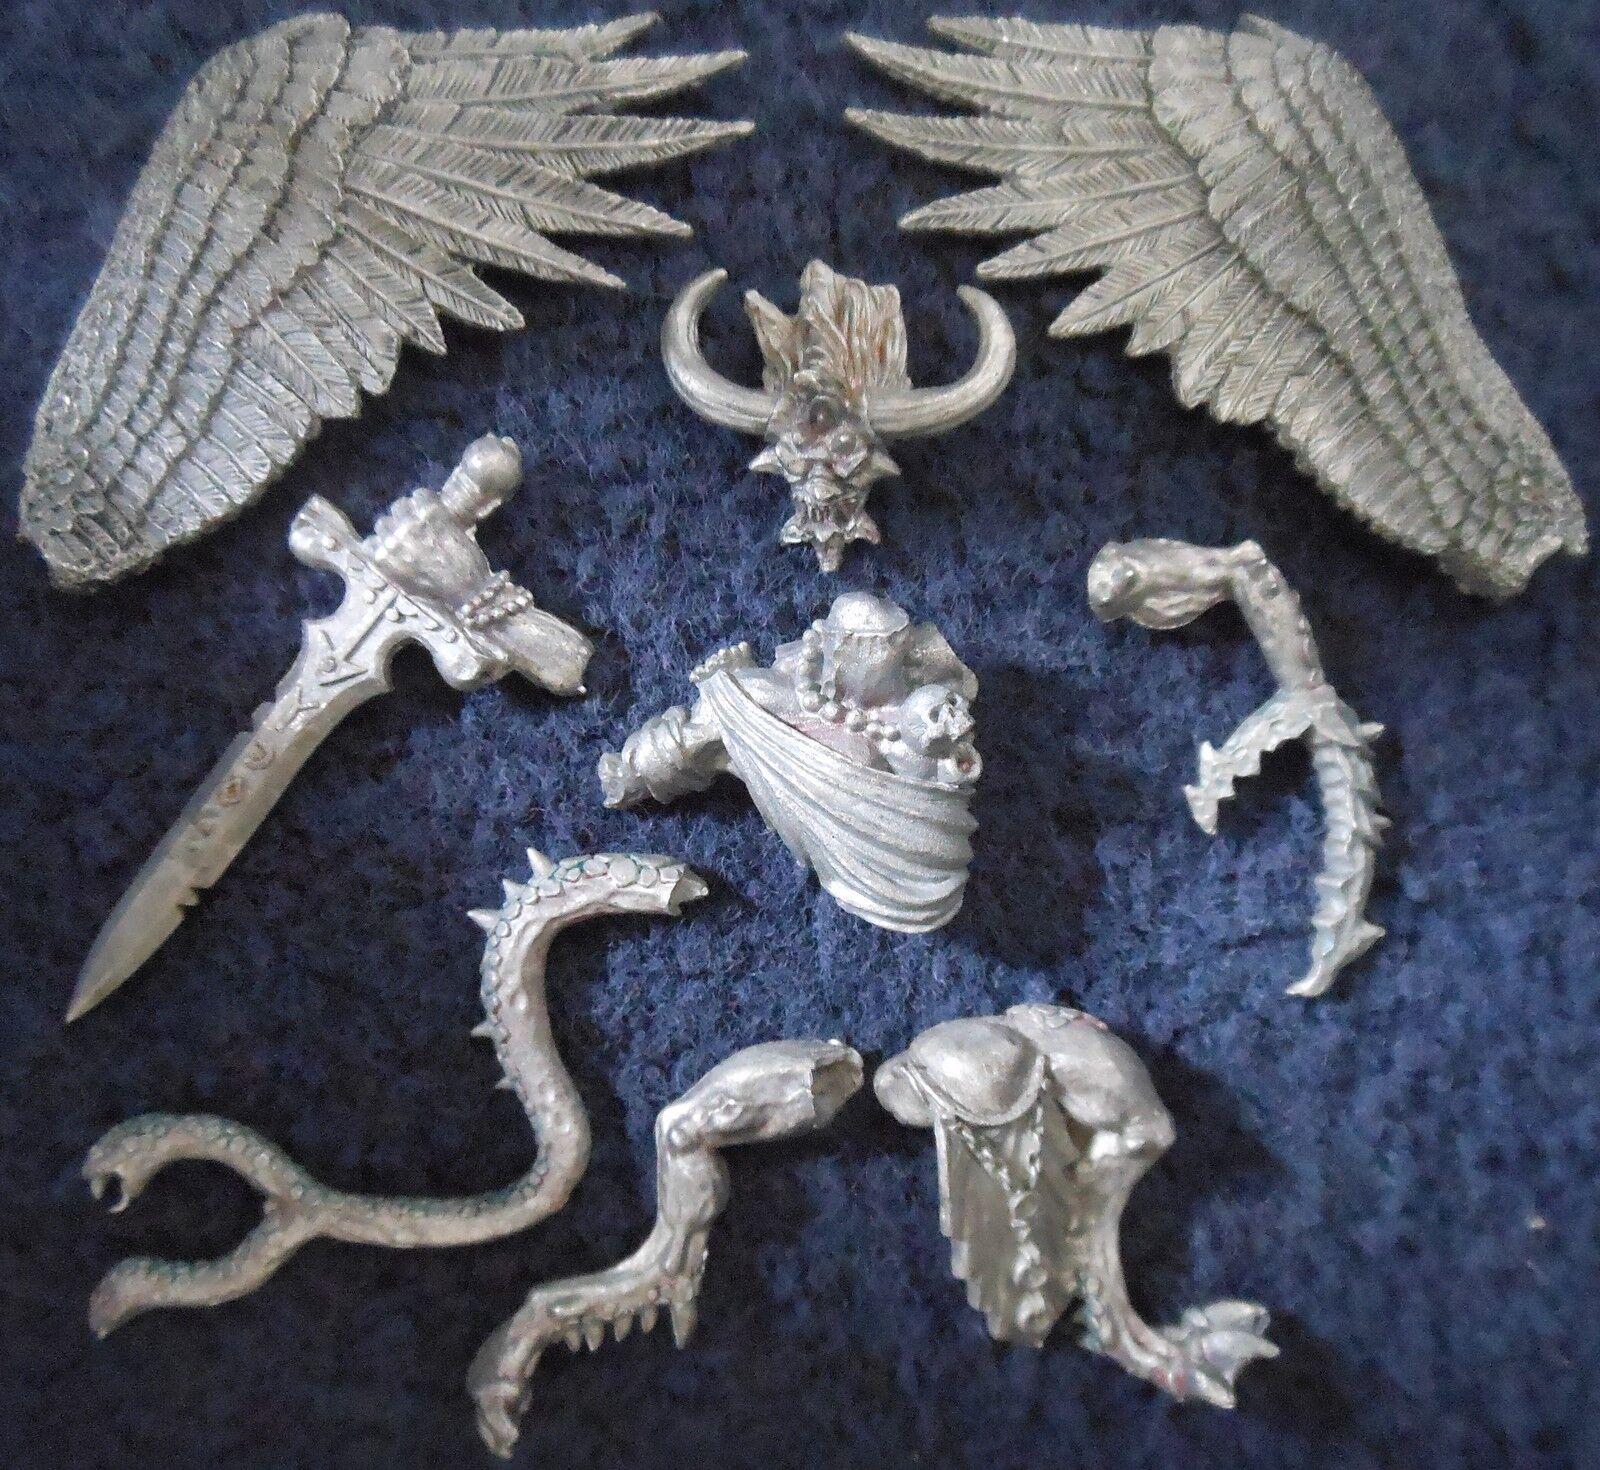 2000 Caos Azazel Principe della Dannazione DAEMON Games Workshop WARHAMMER Demone 40K